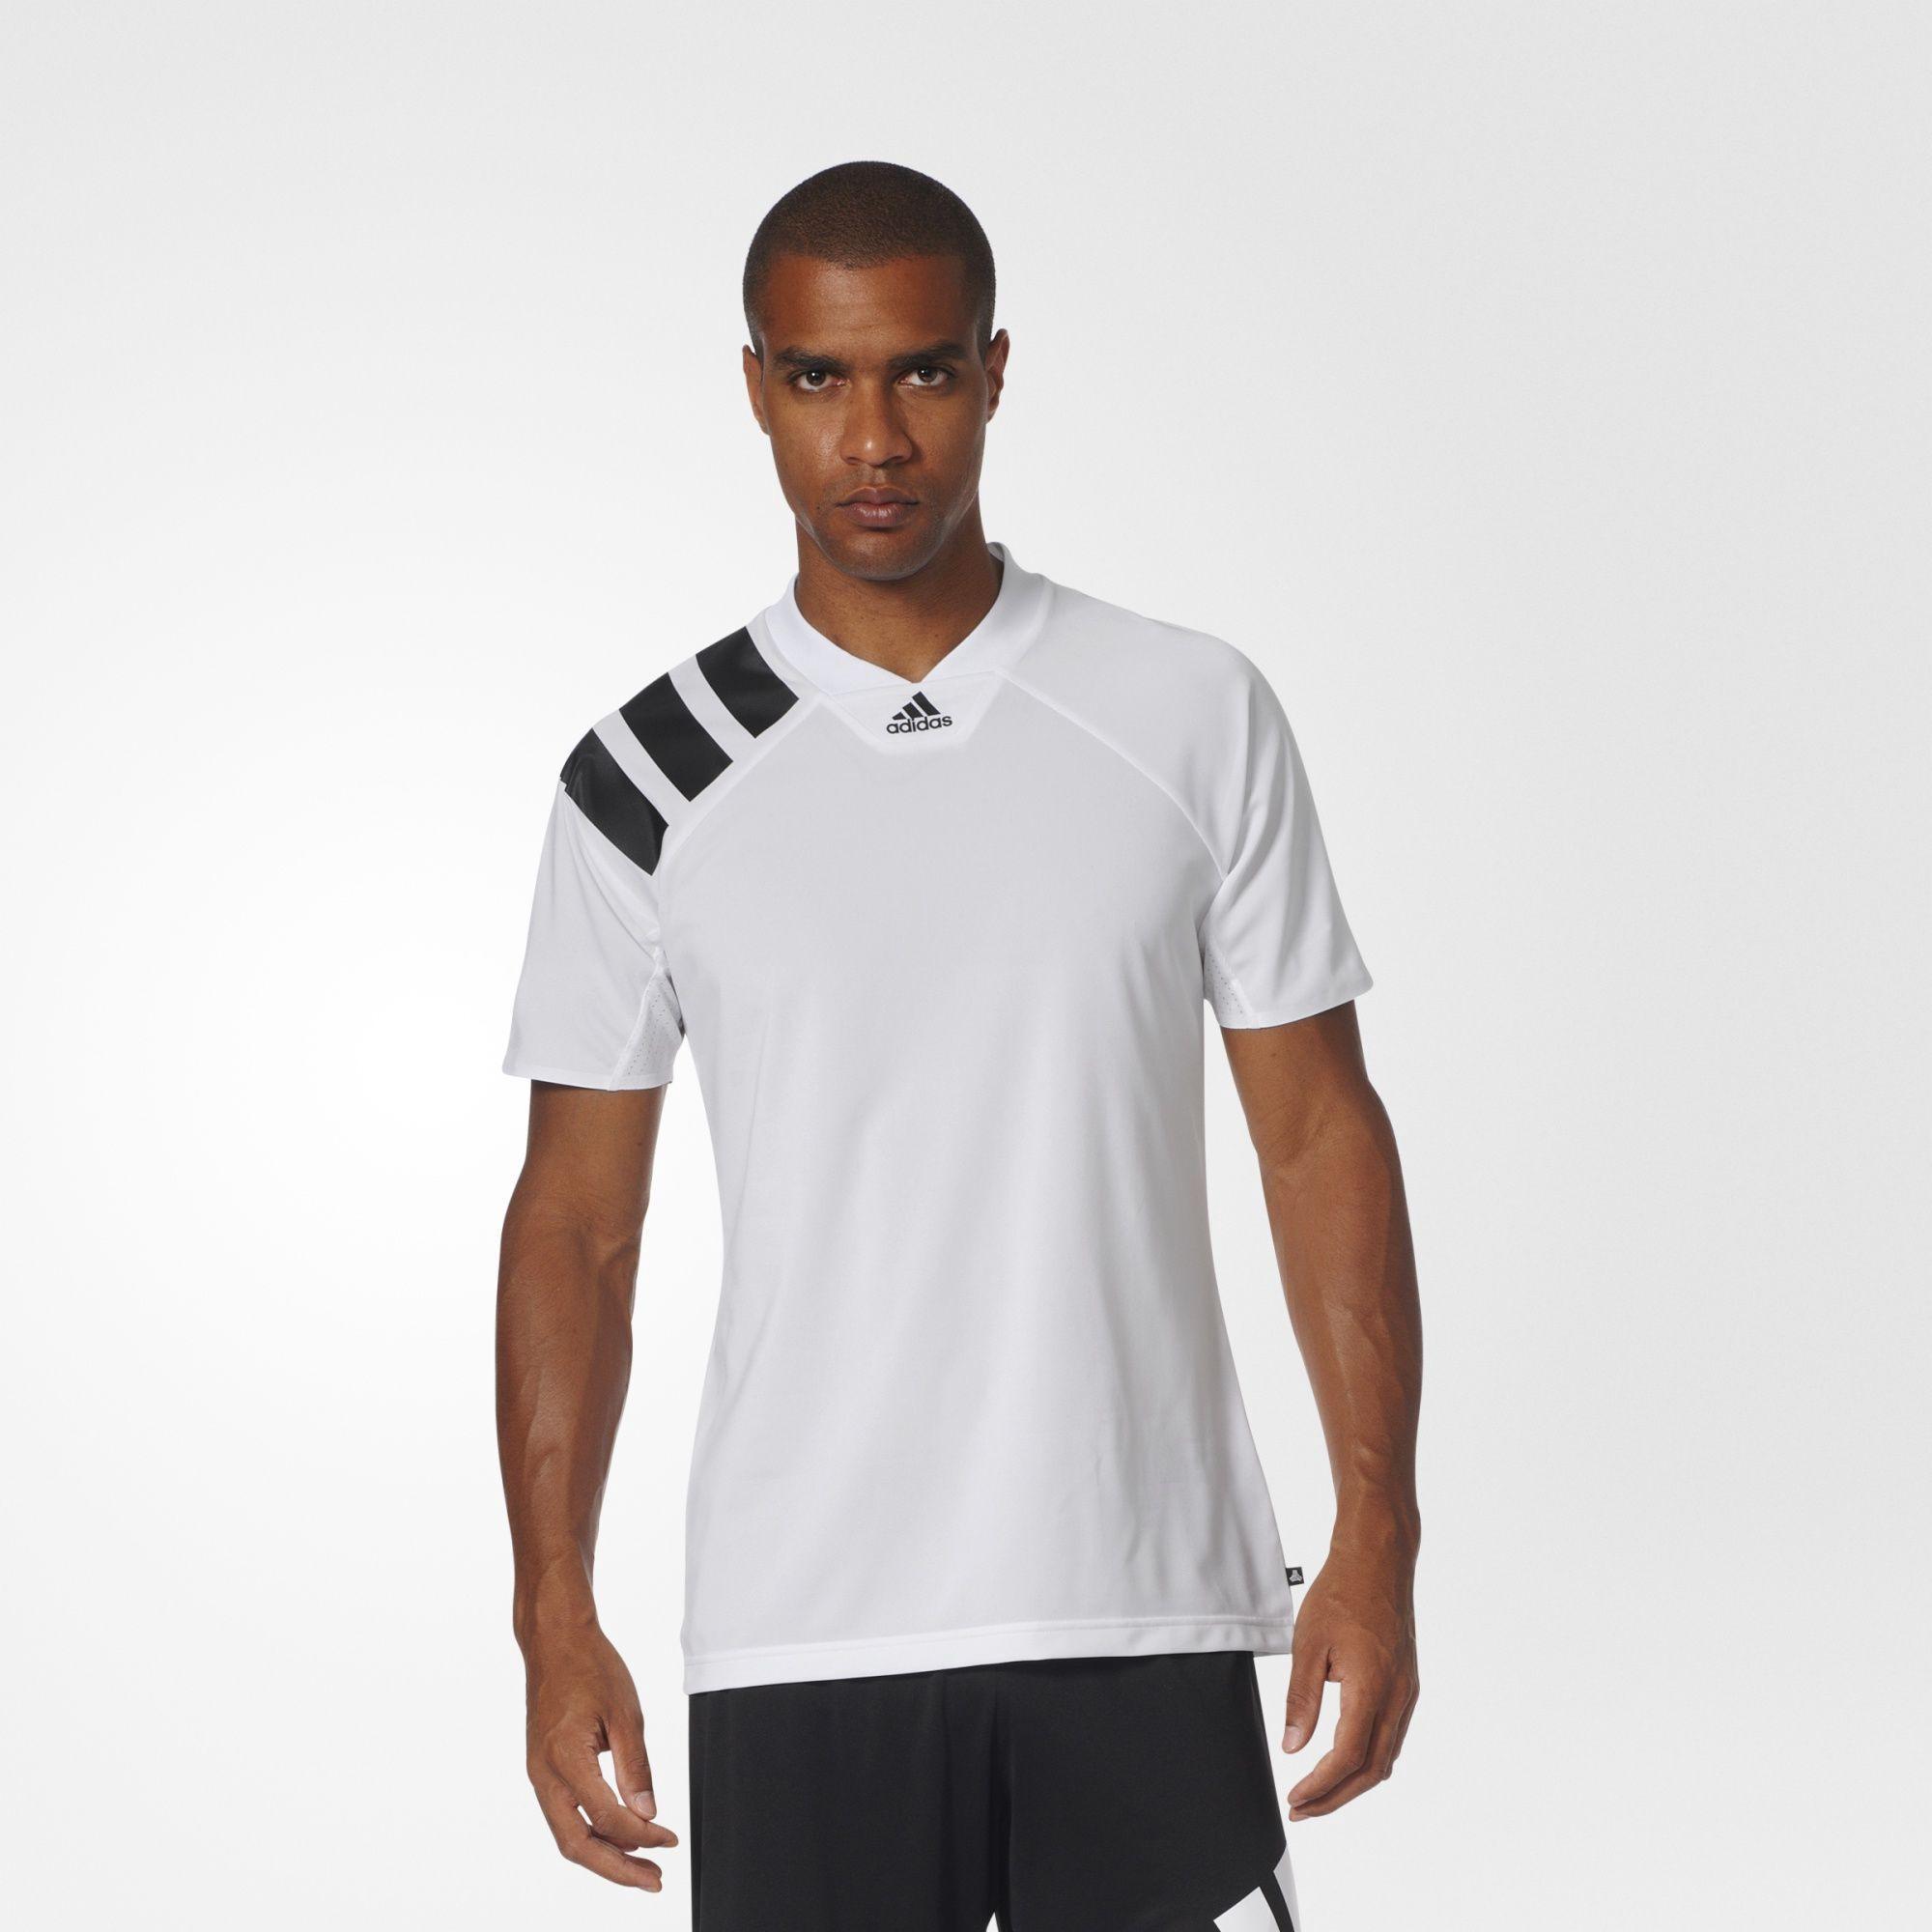 Adidas Originals Tango Stadium Icon Jersey In White/black   ModeSens